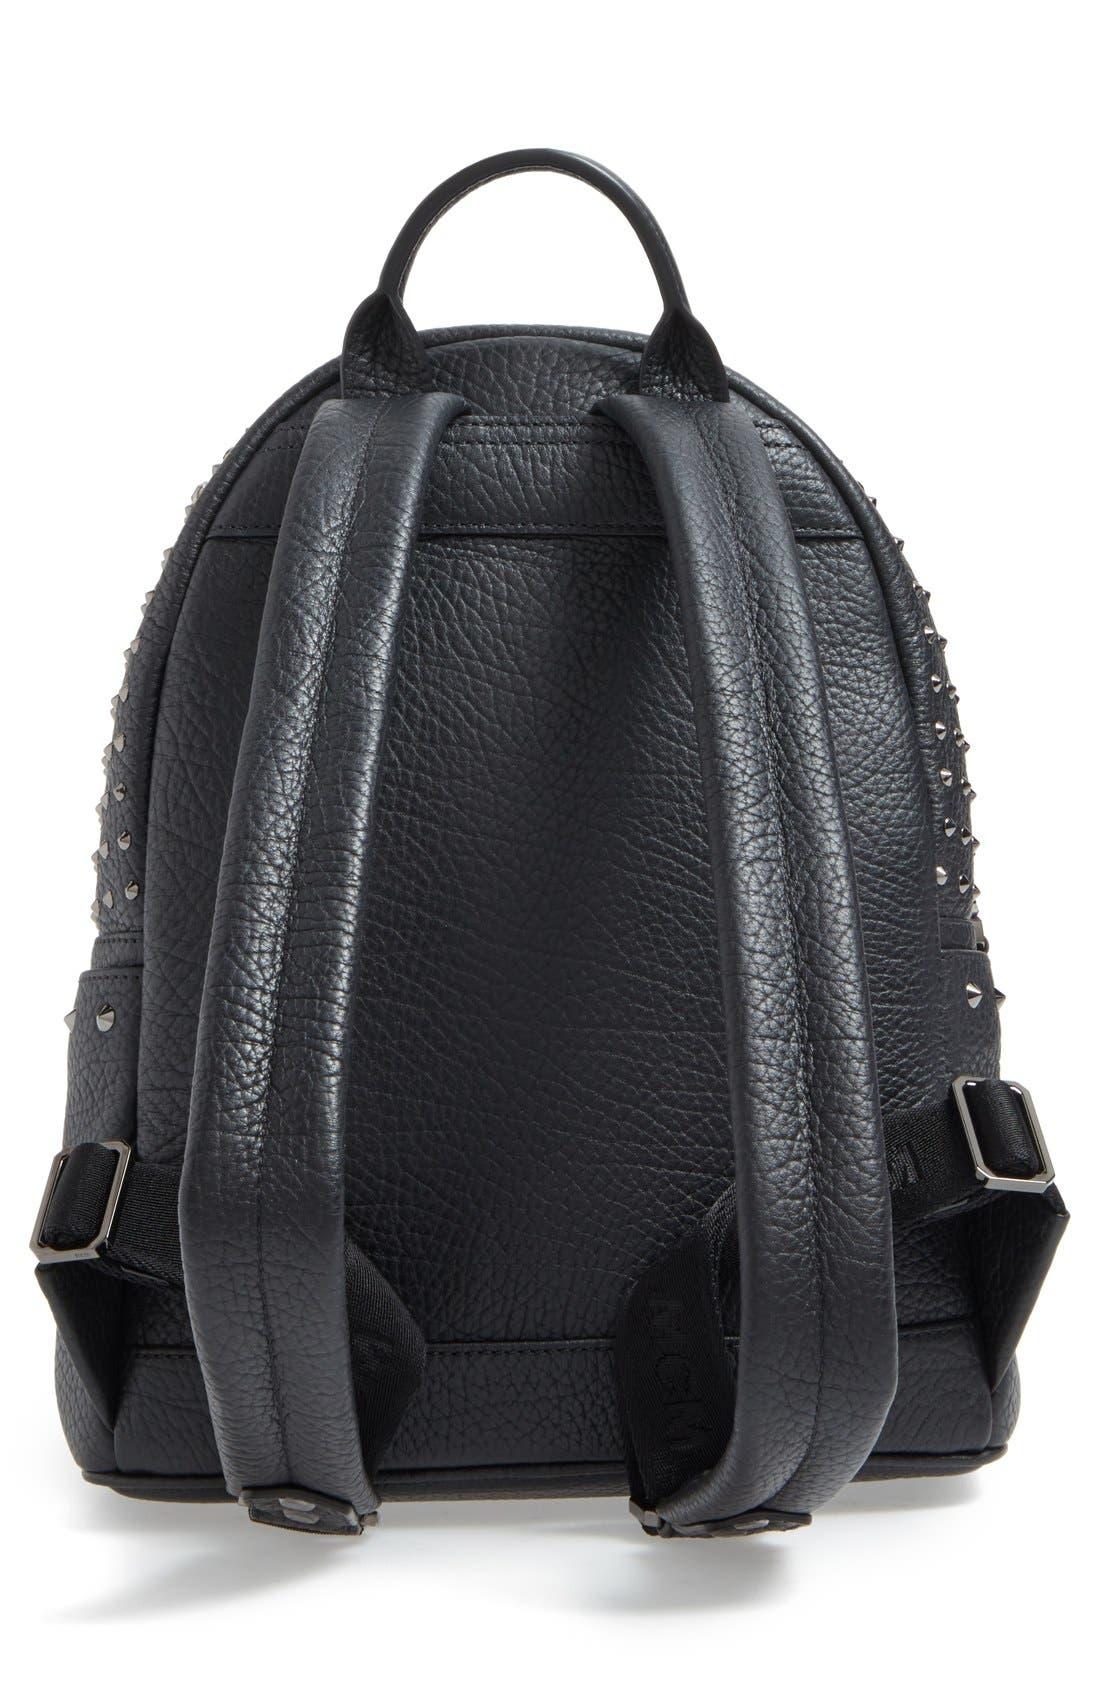 'Small Stark Special' Swarovski Crystal Embellished Leather Backpack,                             Alternate thumbnail 3, color,                             001